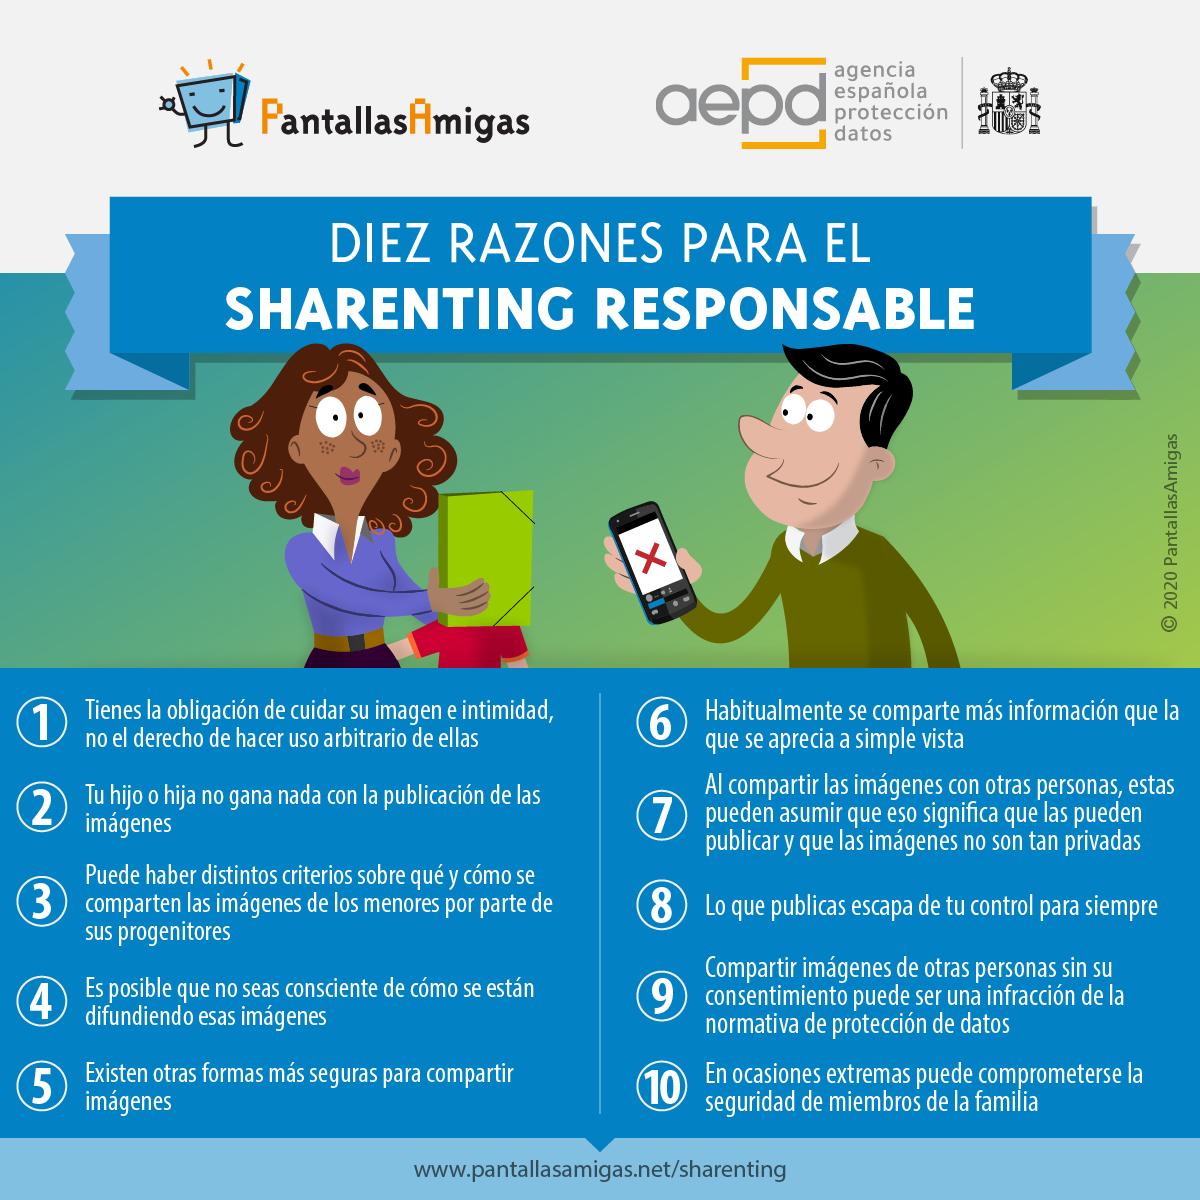 Diez razones para el sharenting responsable